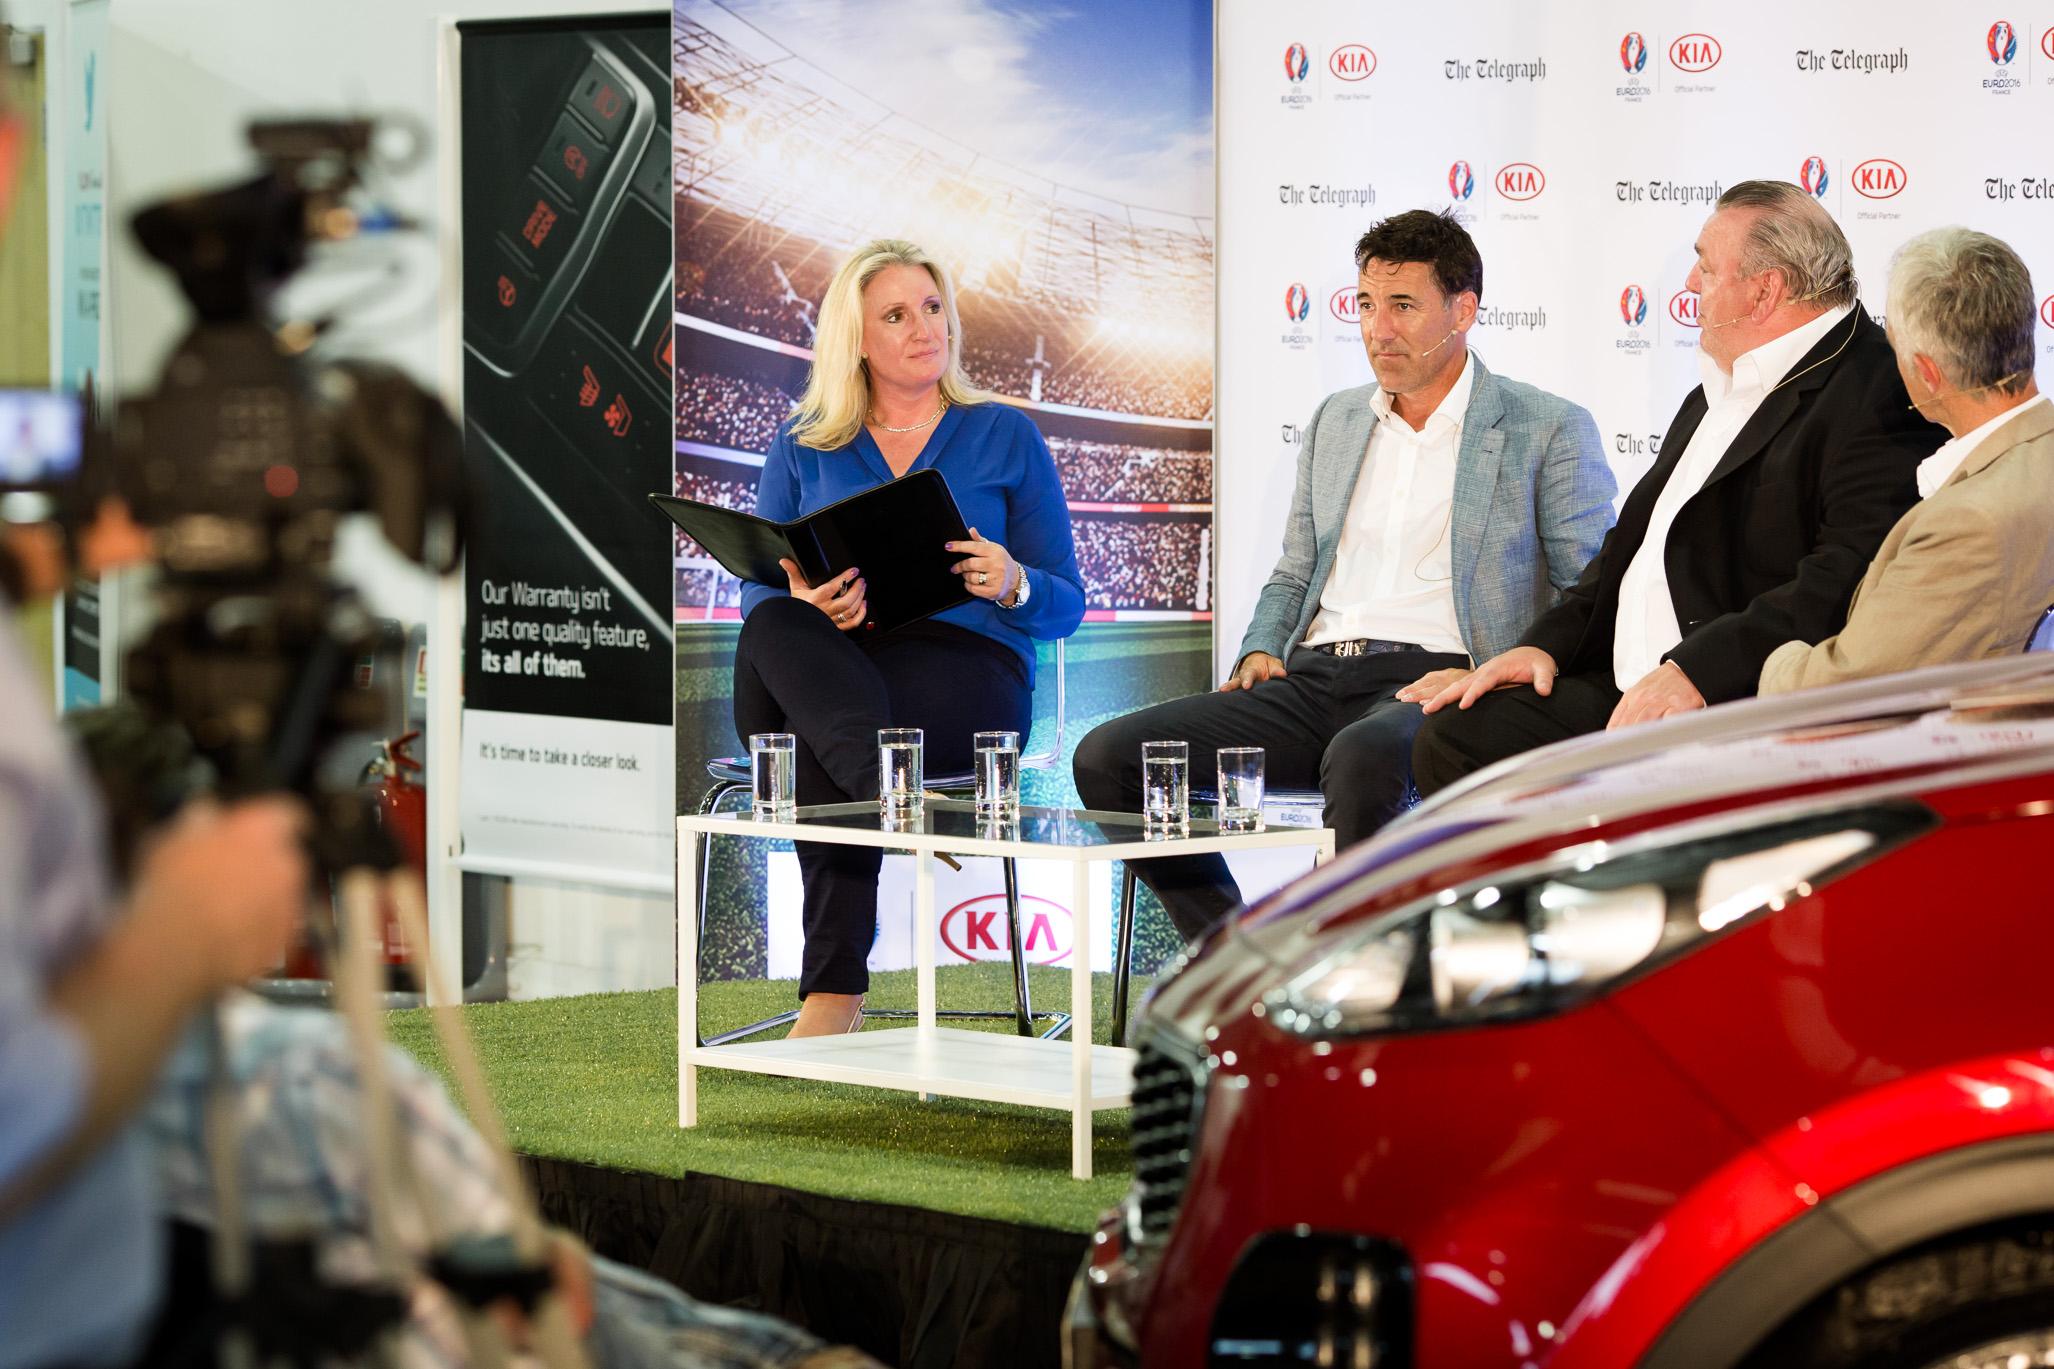 Euro 2016 for The Telegraph / Kia Motors